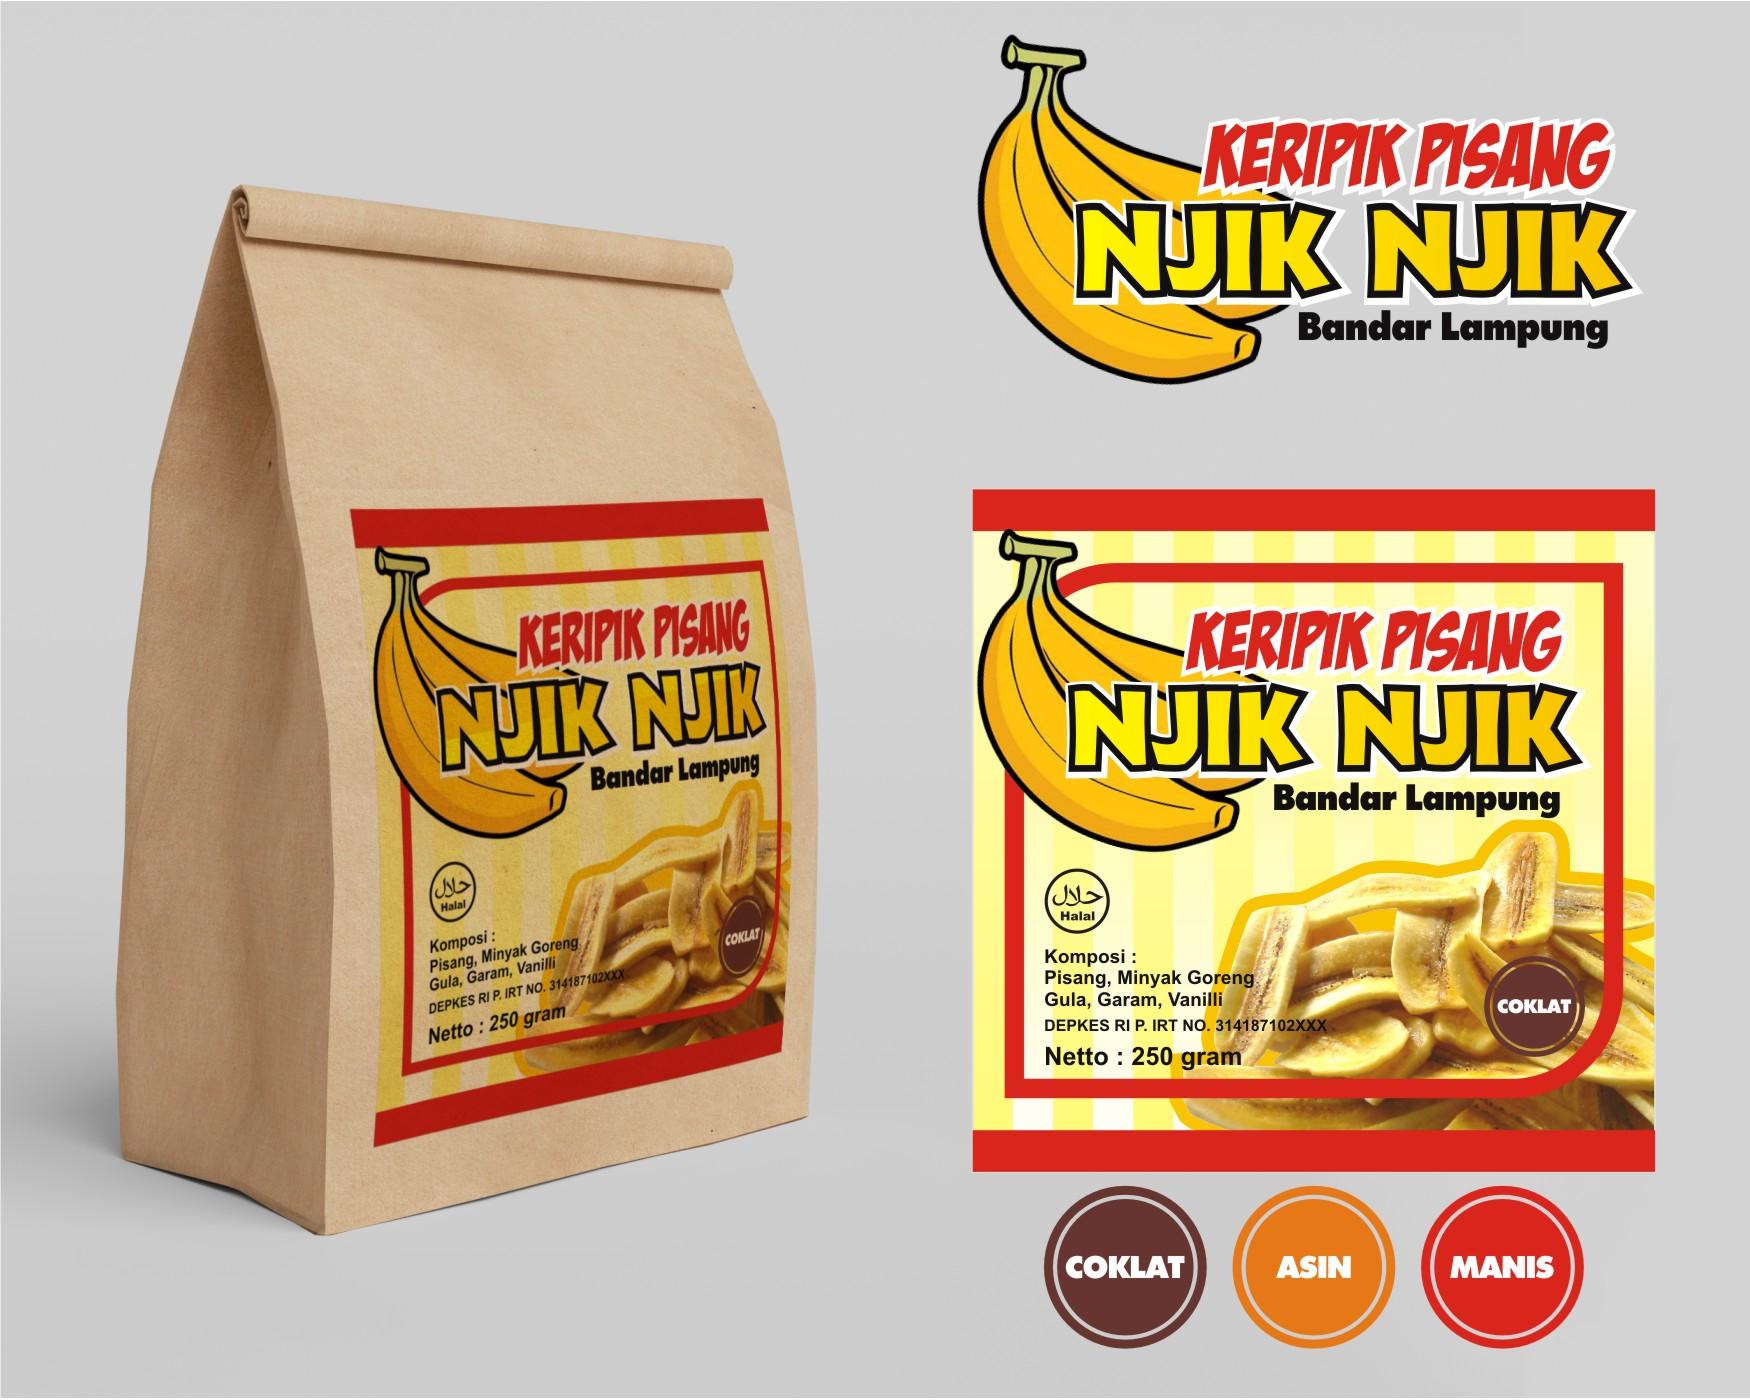 Sribu Desain Merchandising Paper Bag Untuk Keripi Keripik Pisang By Mulqi Rasa 1c6d2512a3